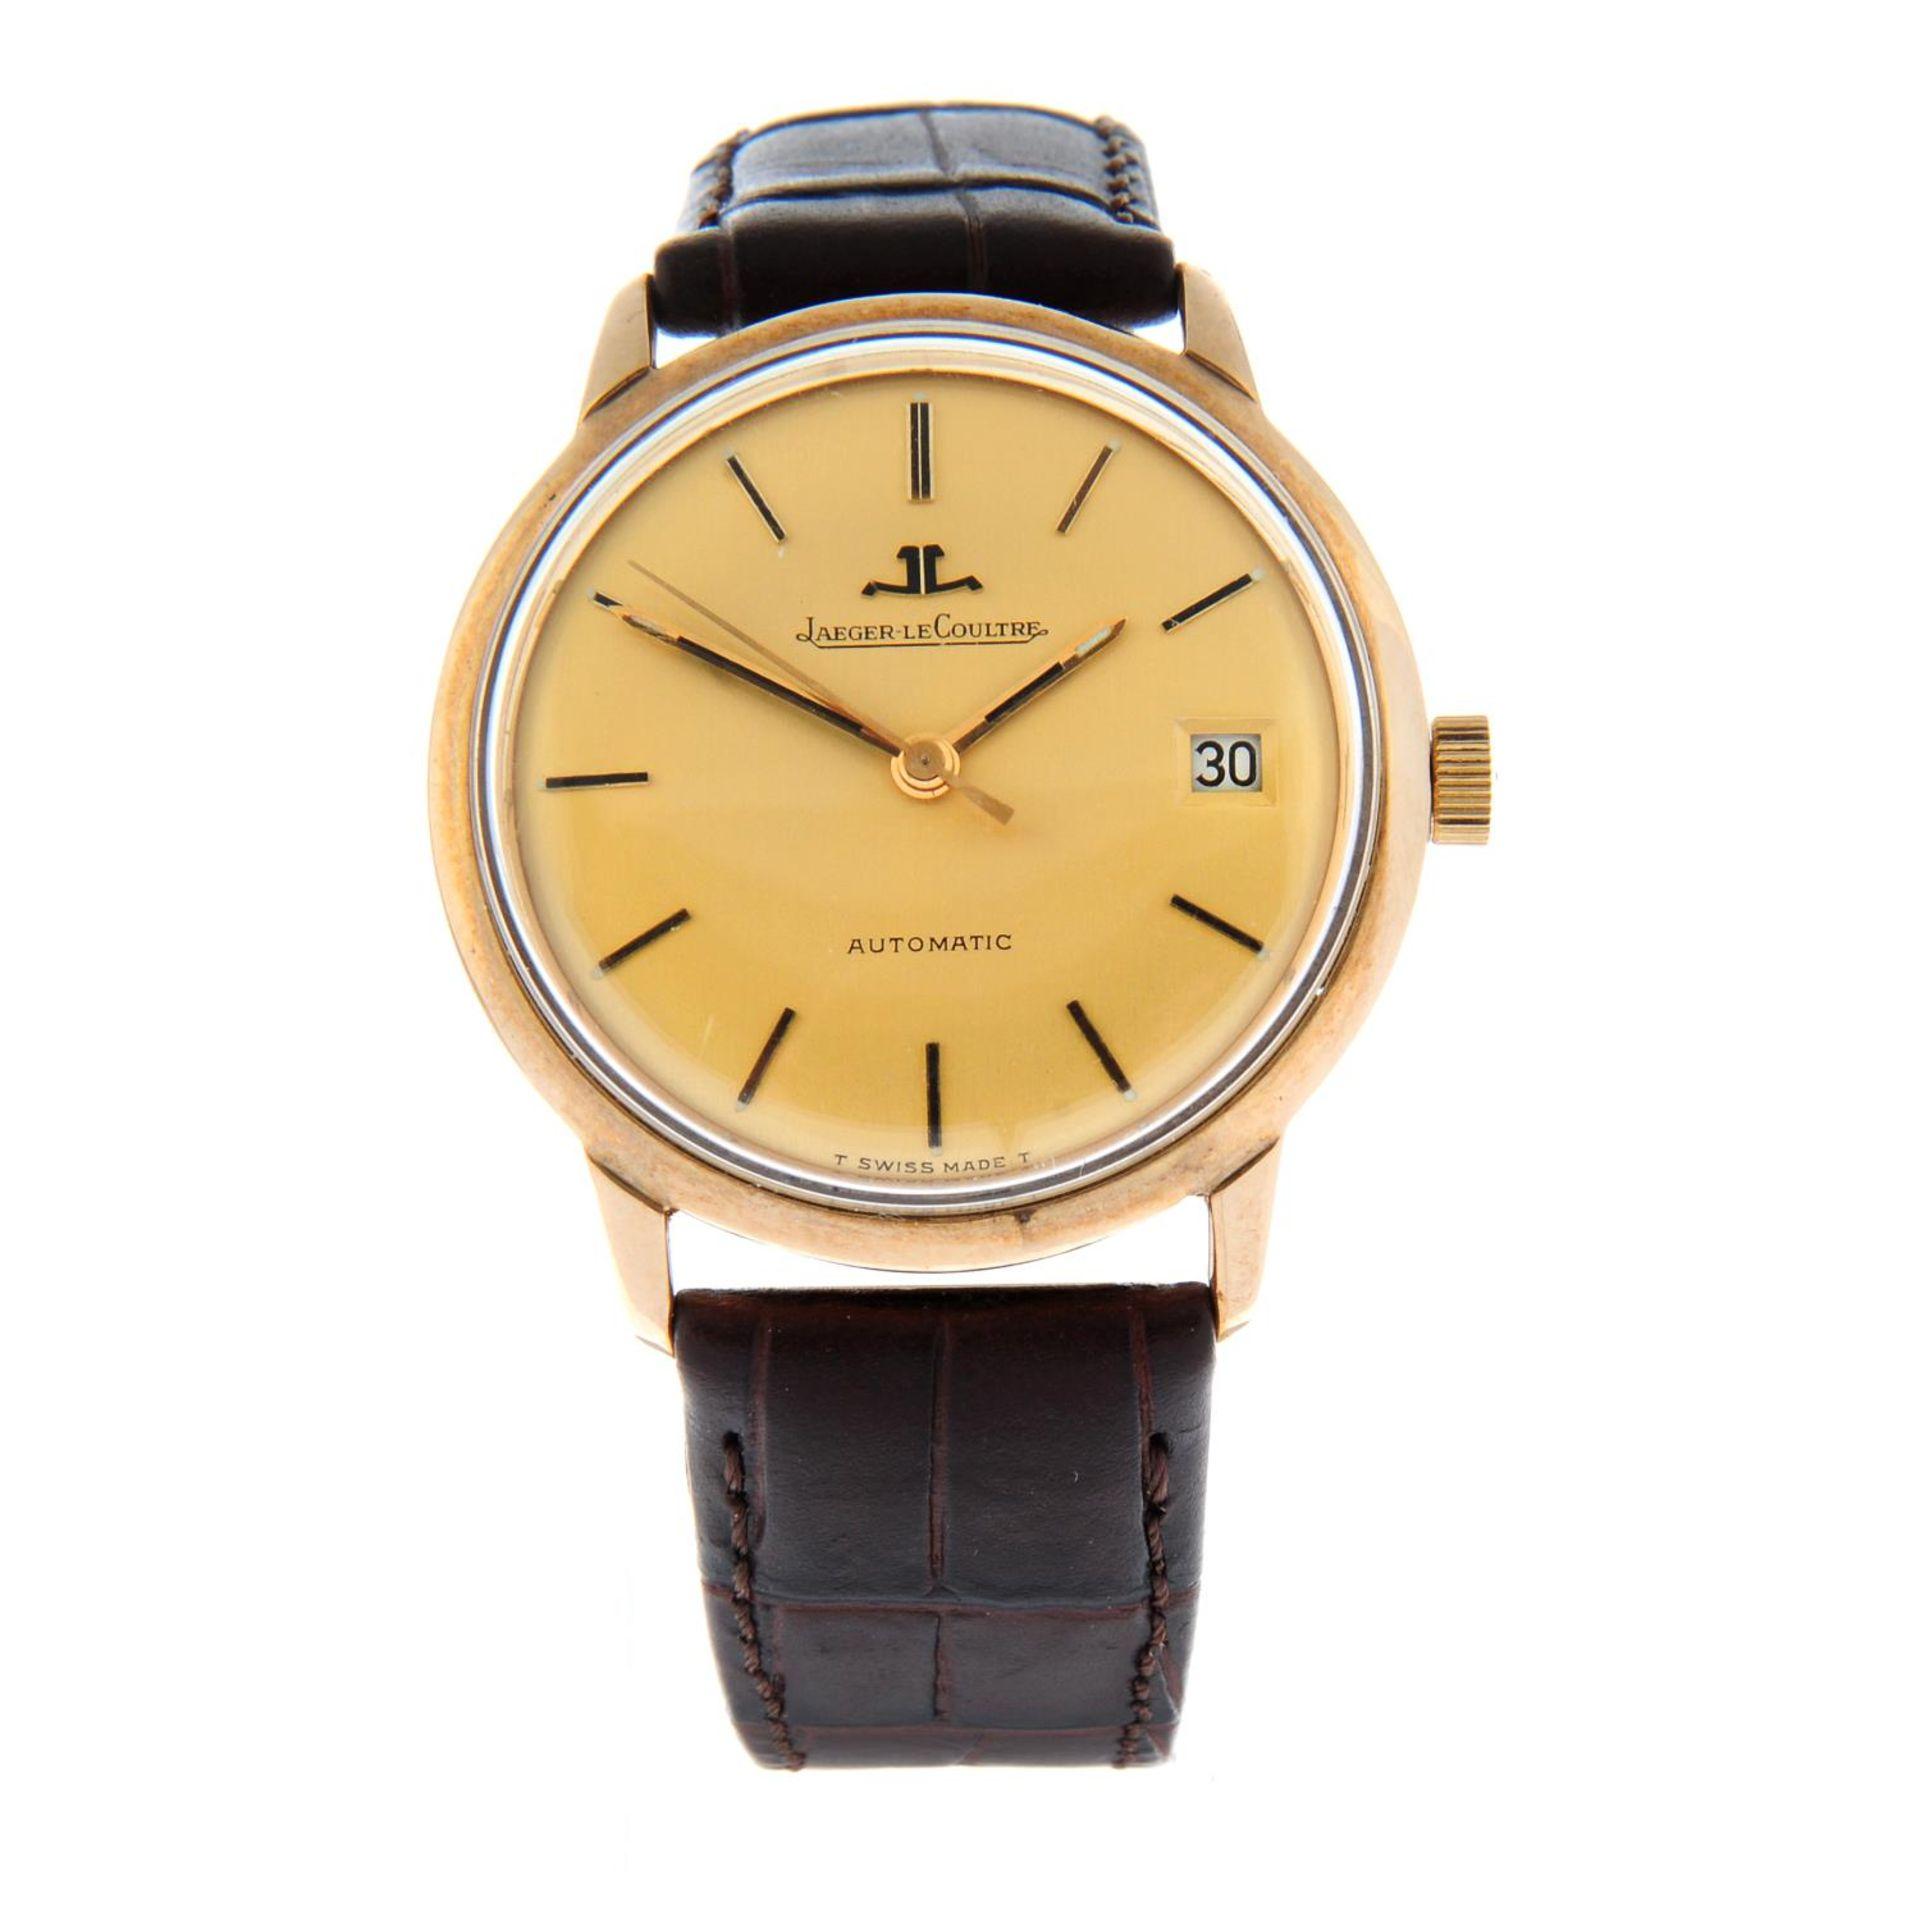 JAEGER-LECOULTRE - a wrist watch.